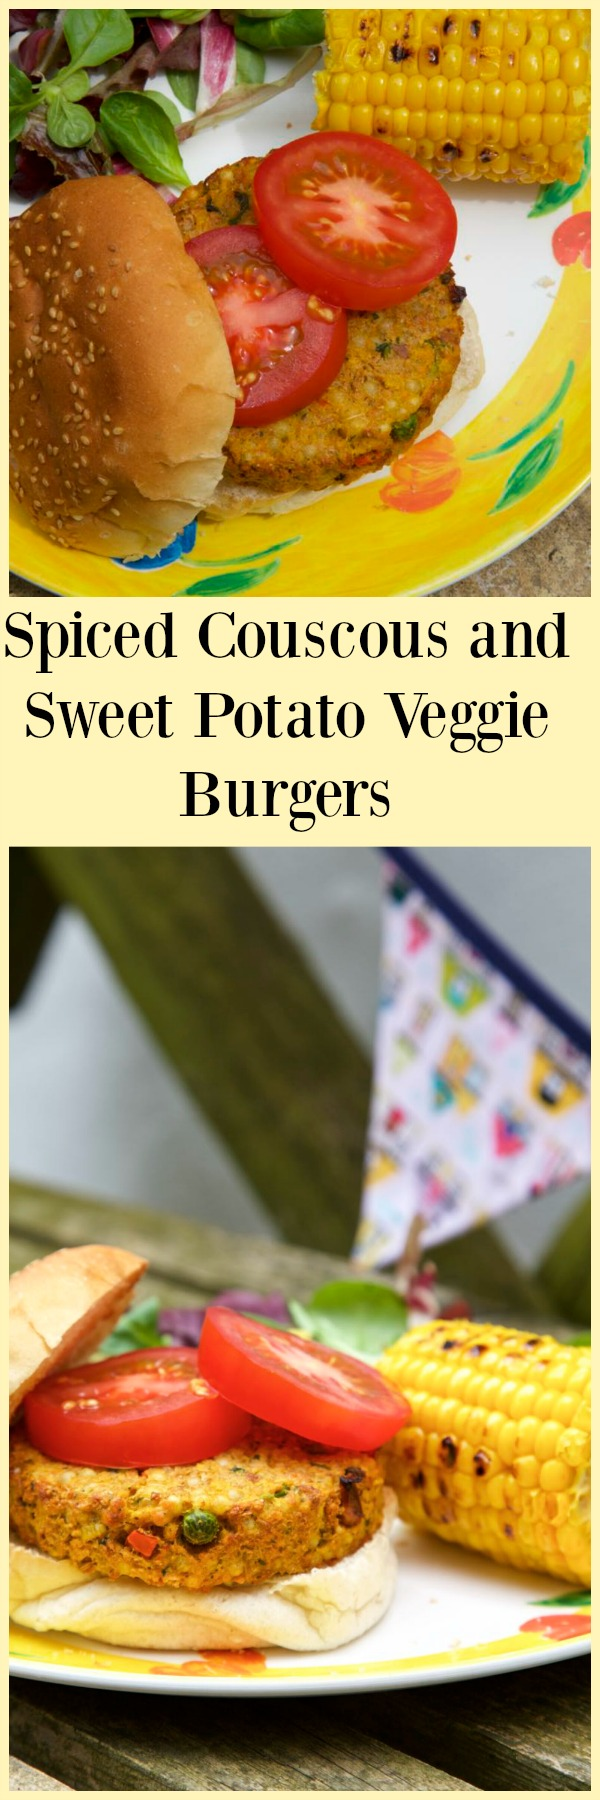 Spiced Couscous and Sweet Potato Veggie Burgers.